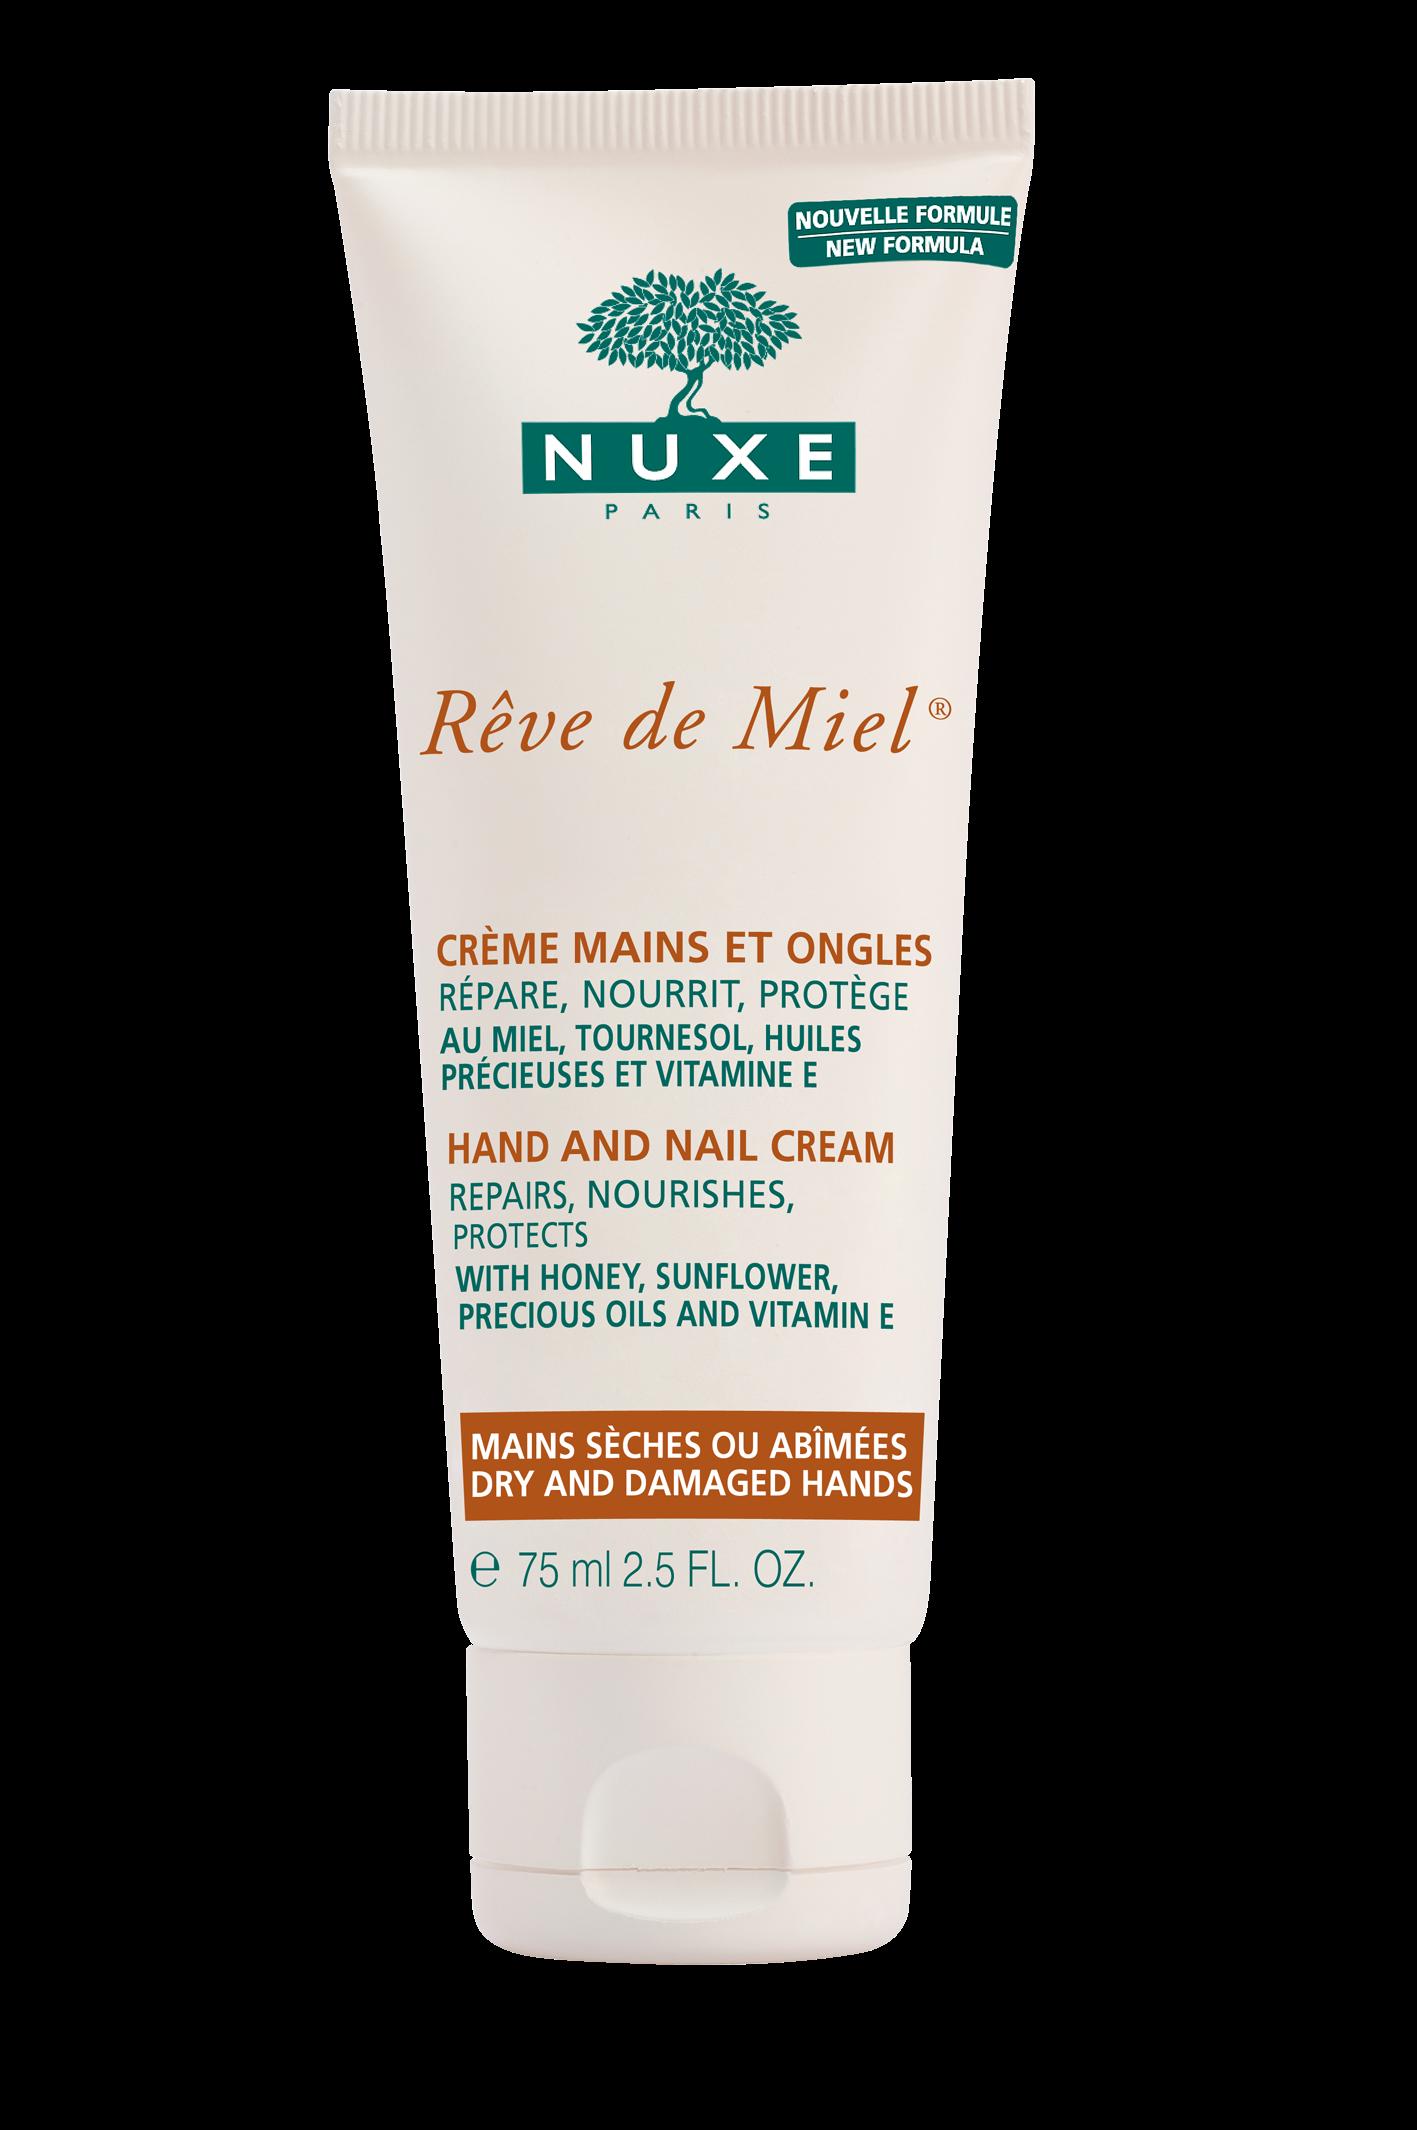 Nuxe Reve De Miel Creme Mains Et Ongles Κρέμα Χεριών και Νυχιών για Θρέψη και Προστασία 75ml